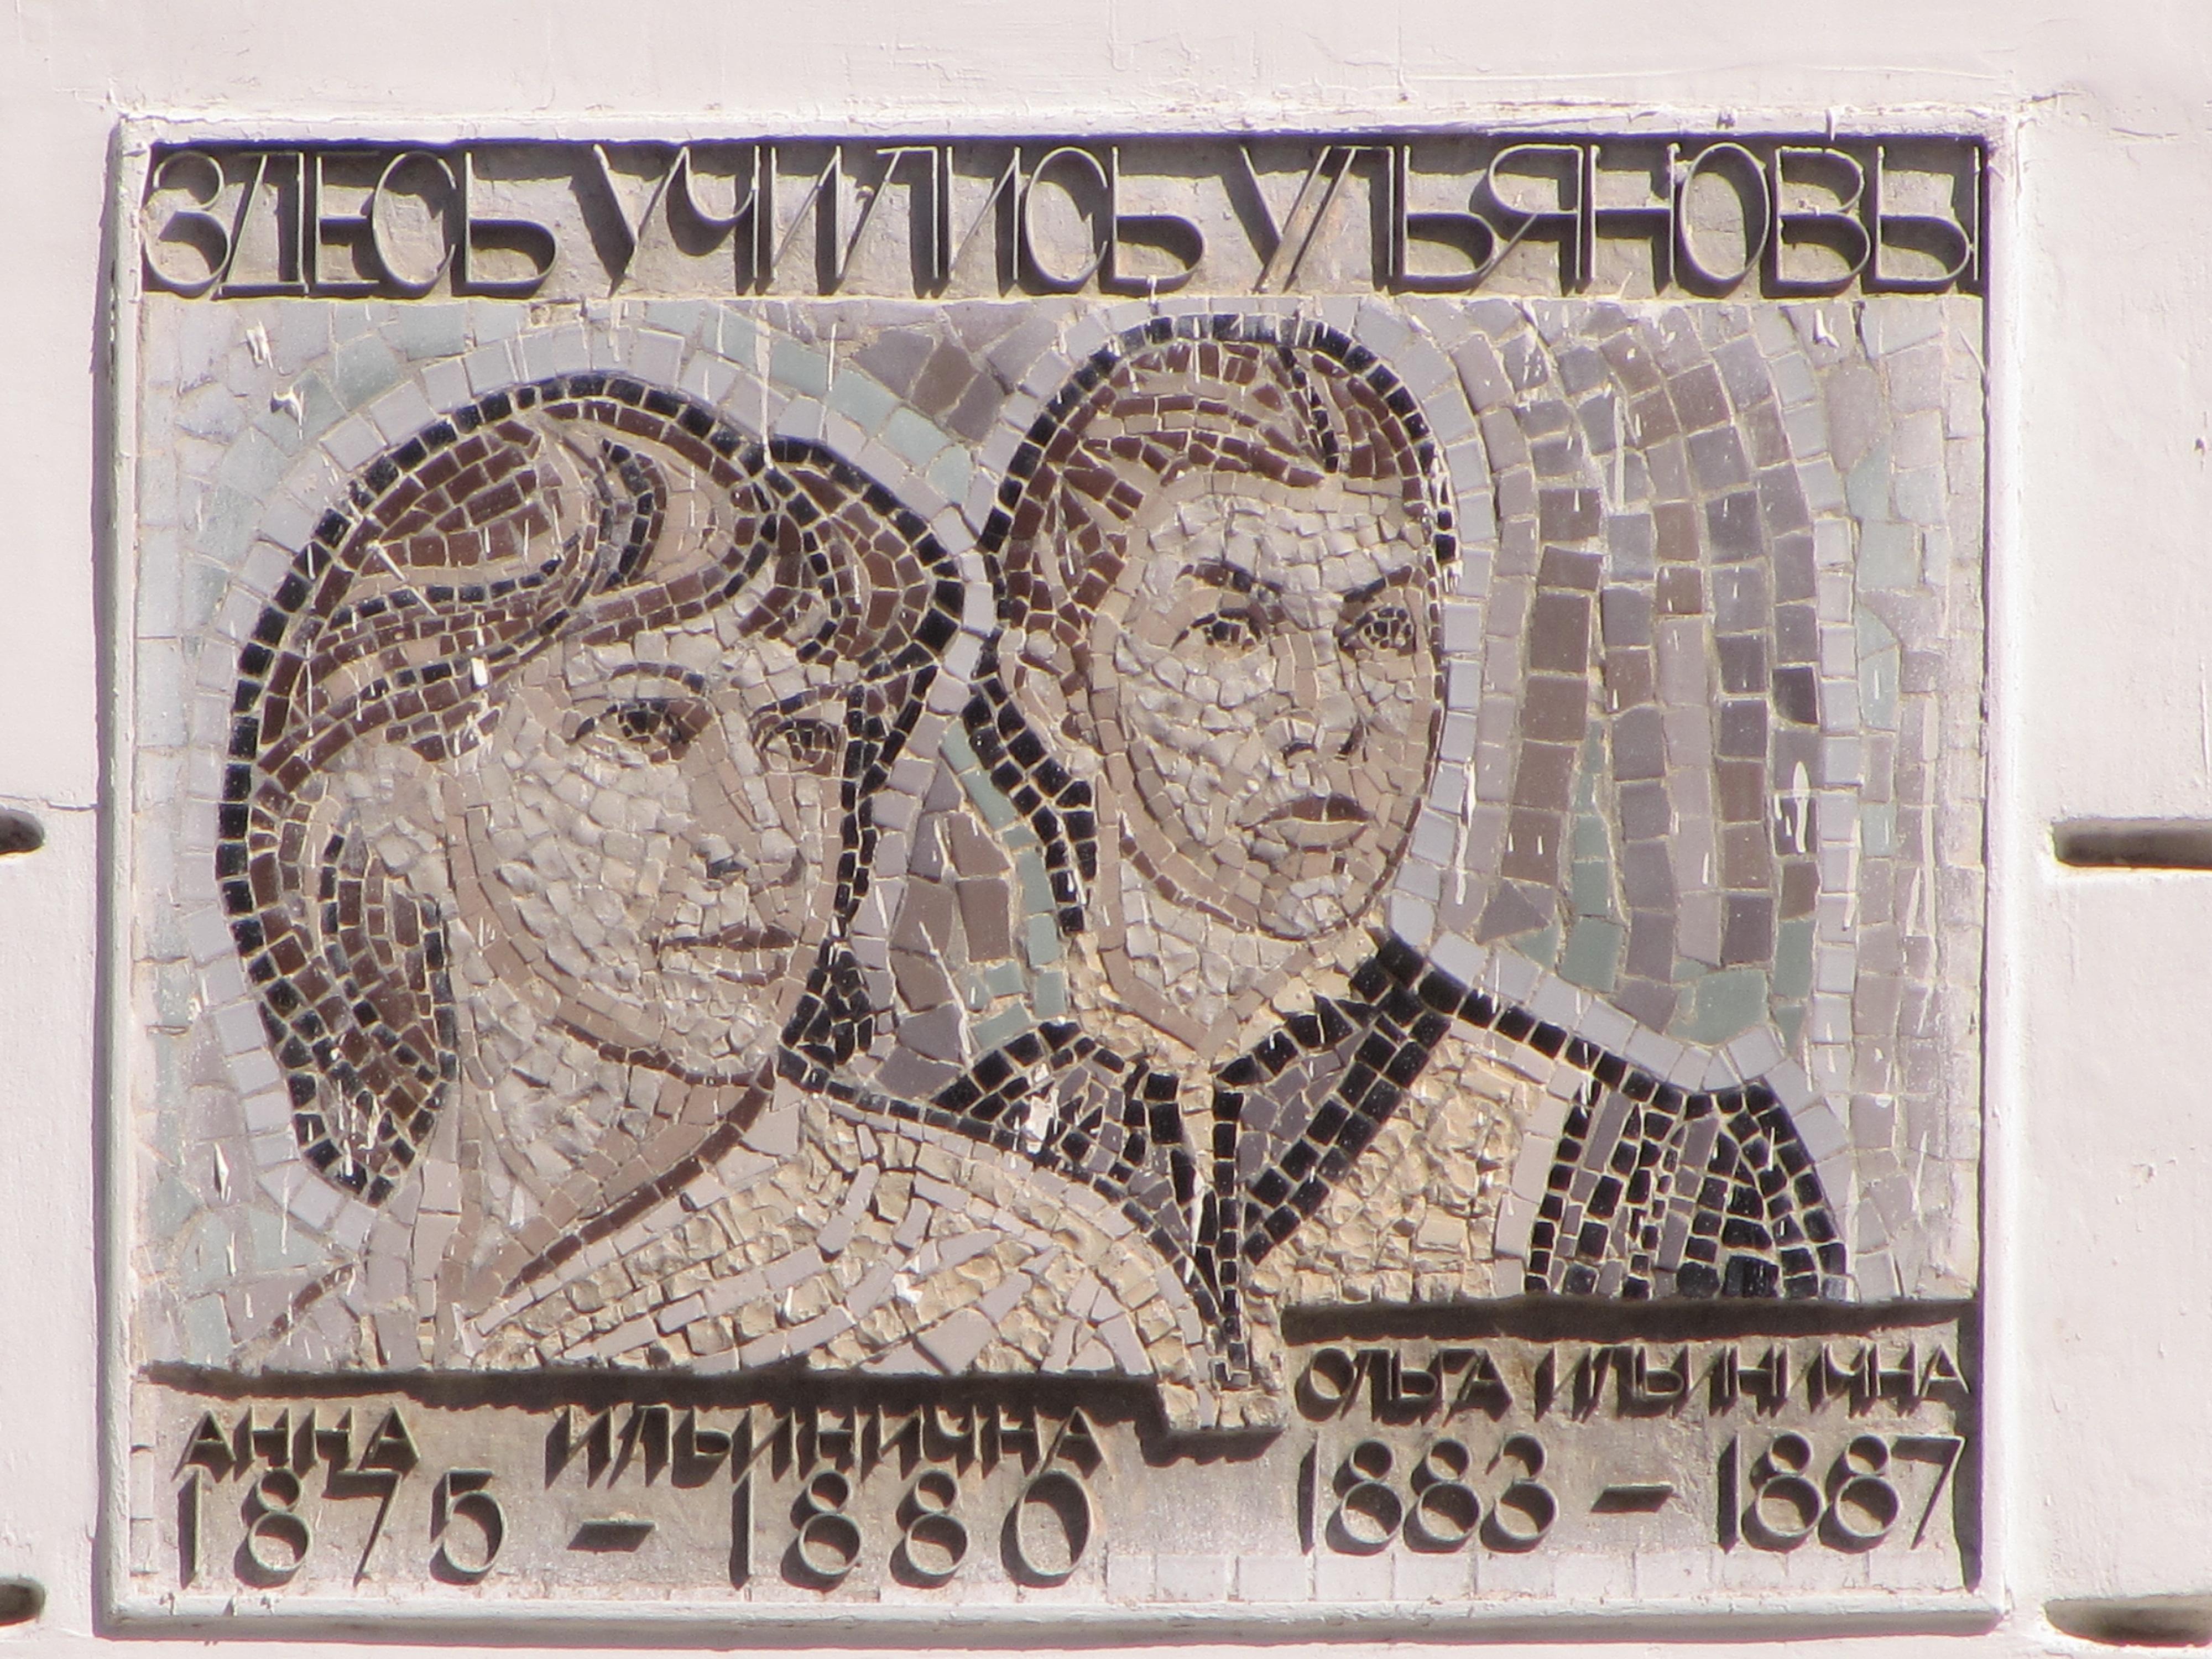 Photo of Anna Ilyinichna Yelizarova-Ulyanova and Olga Ilyinichna Ulyanova multicoloured plaque